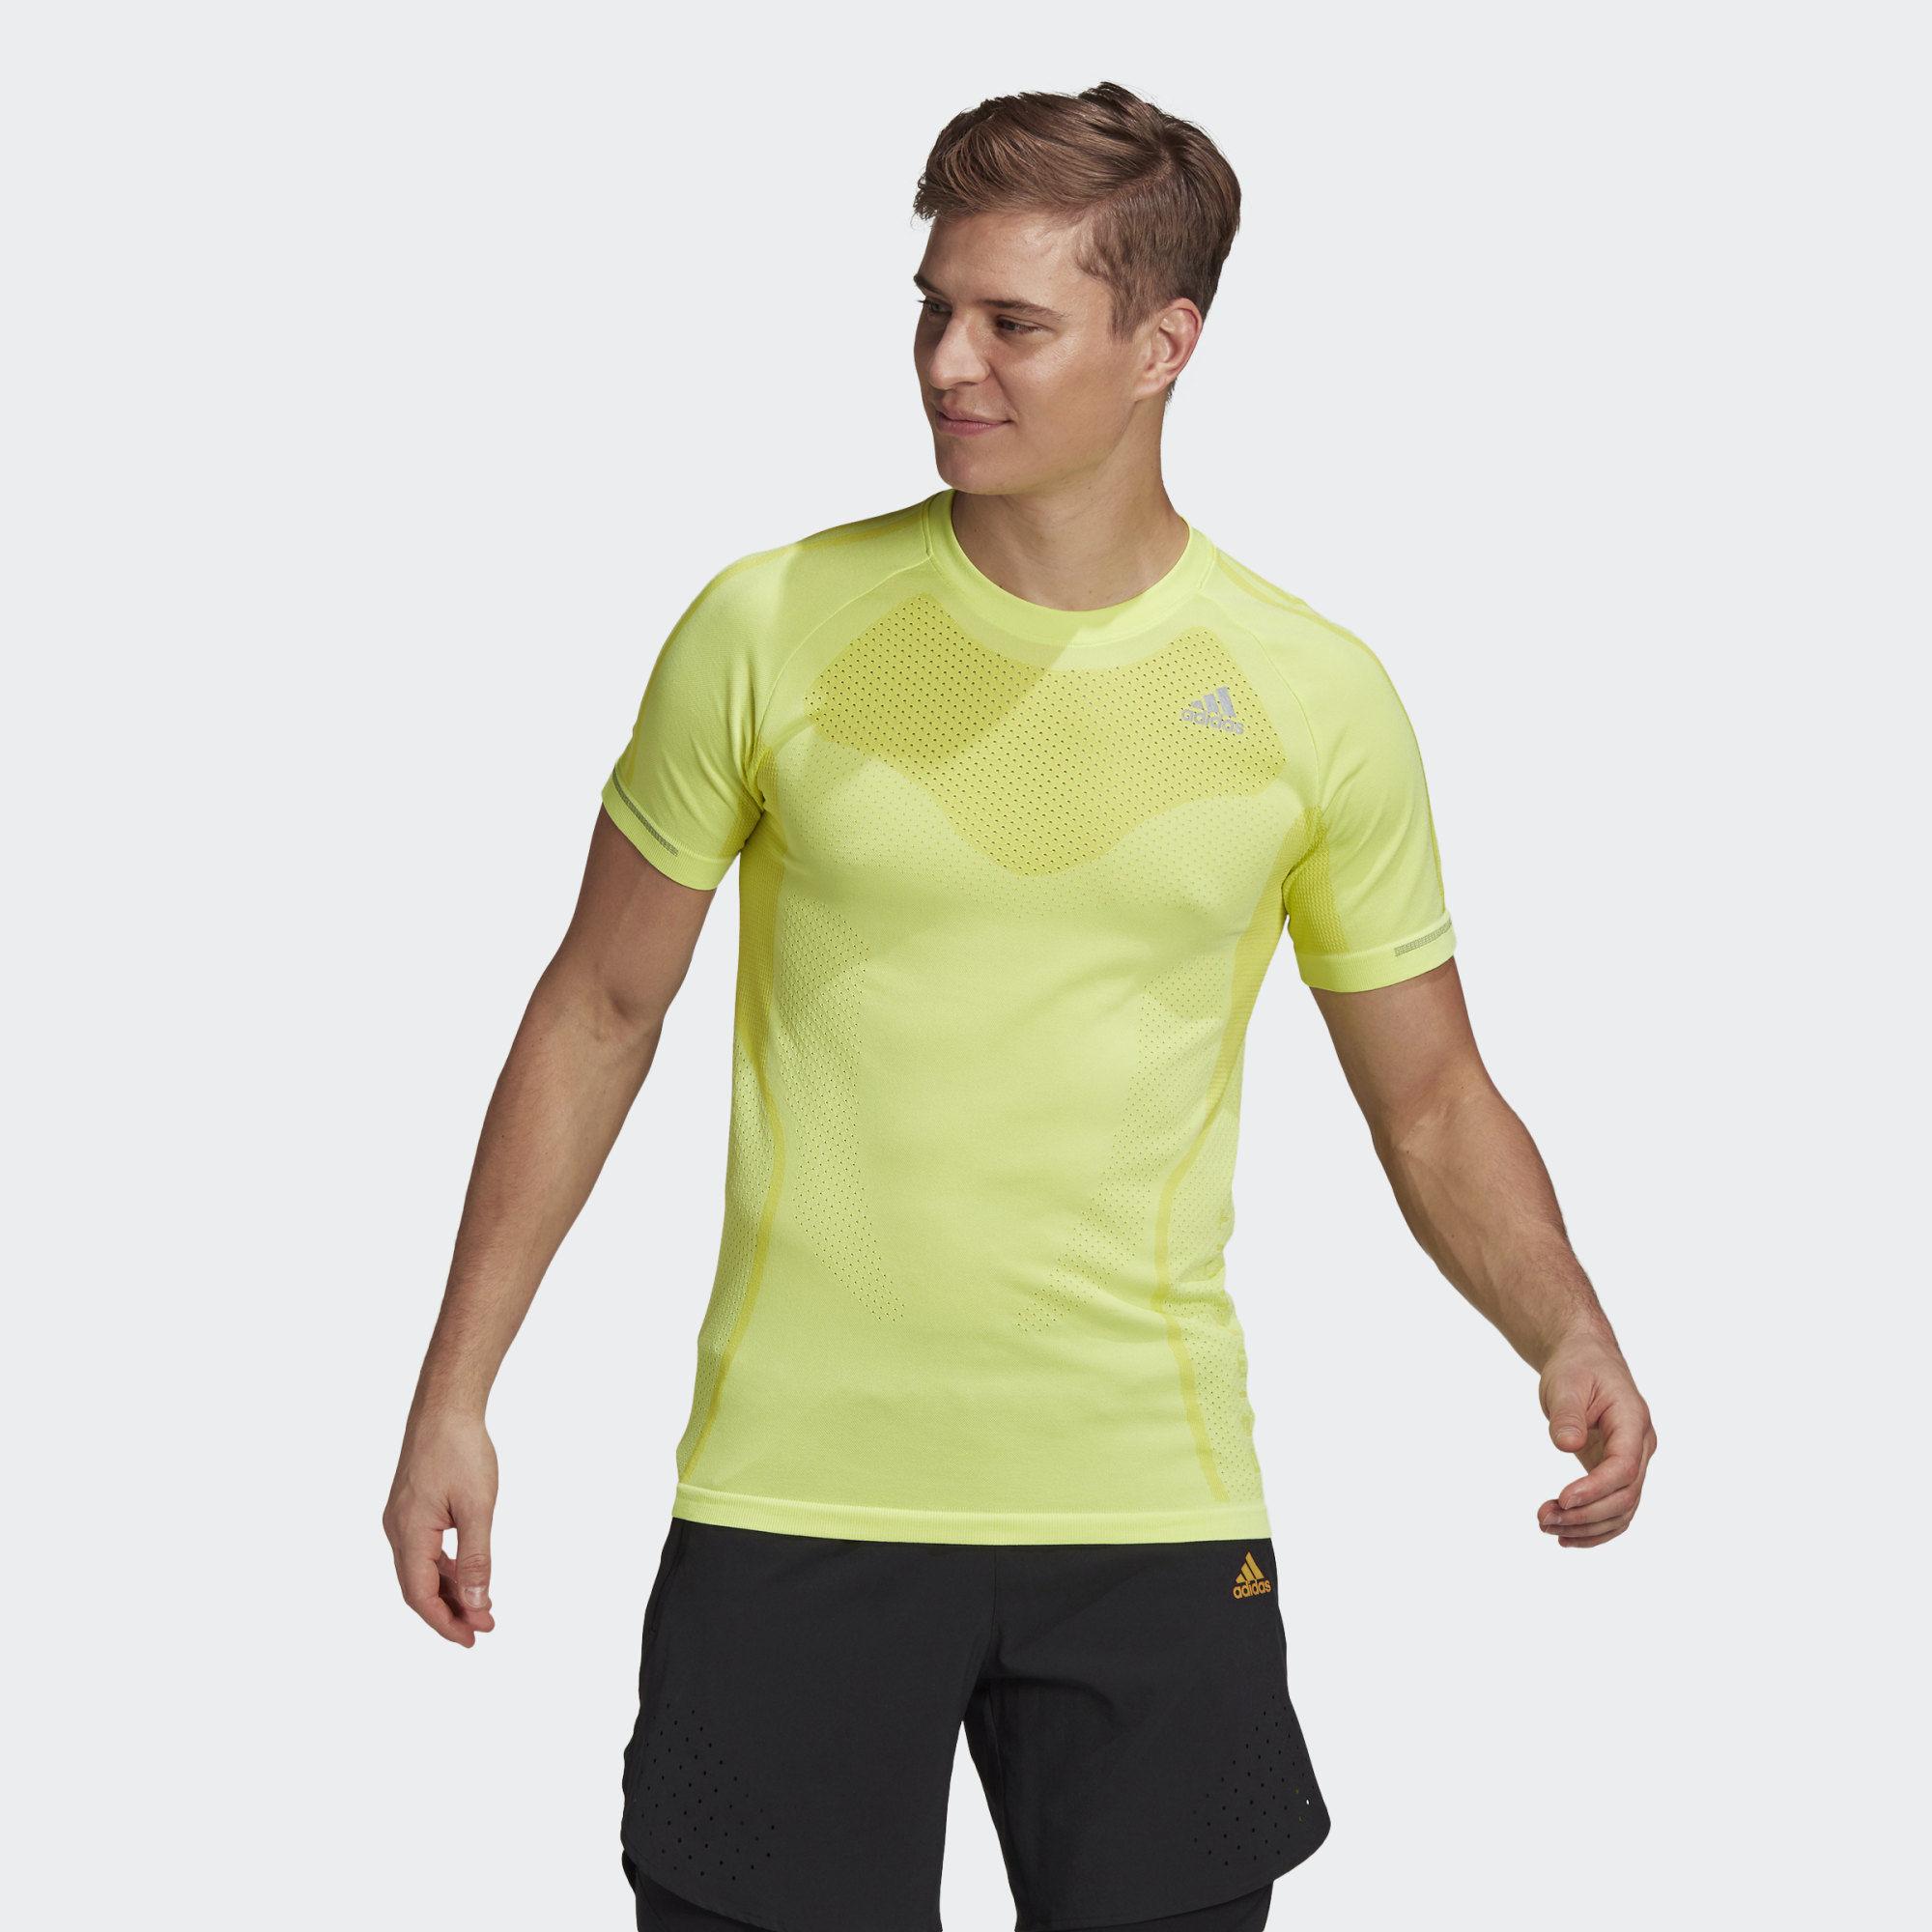 adidas Primeknit Tee (Acid Yellow)